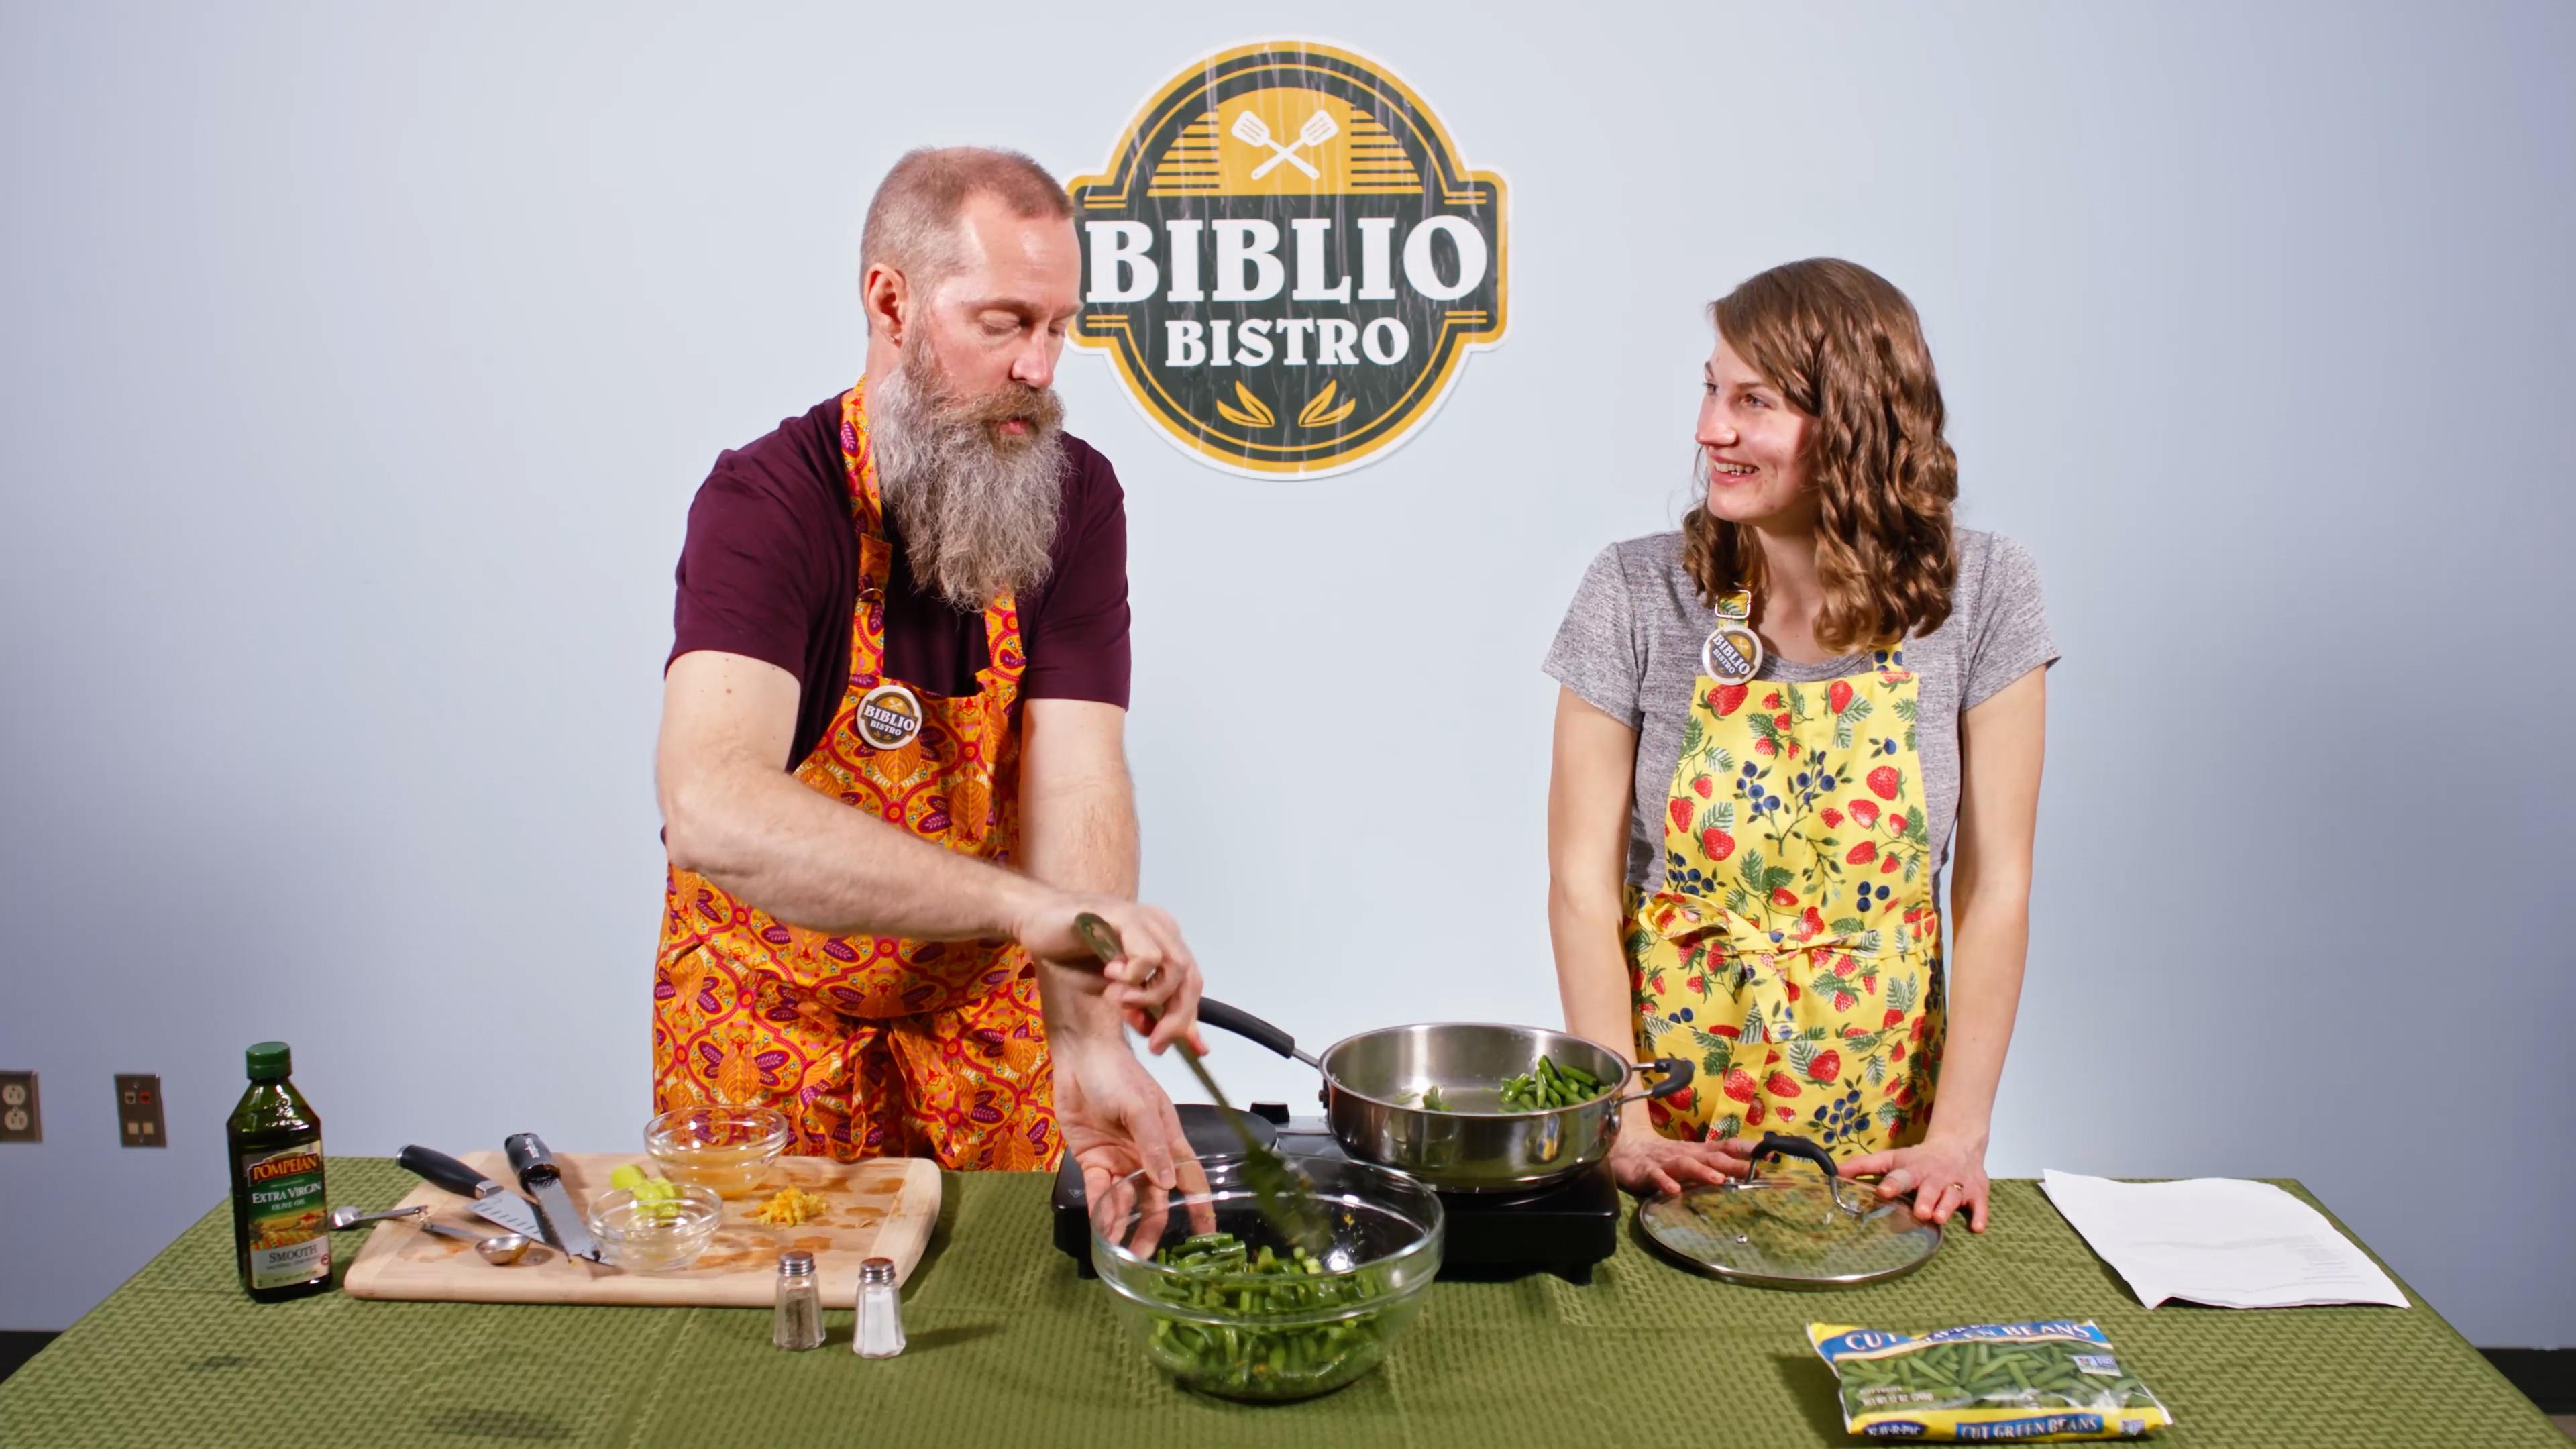 Biblio Bistro - Citrusy Green Beans